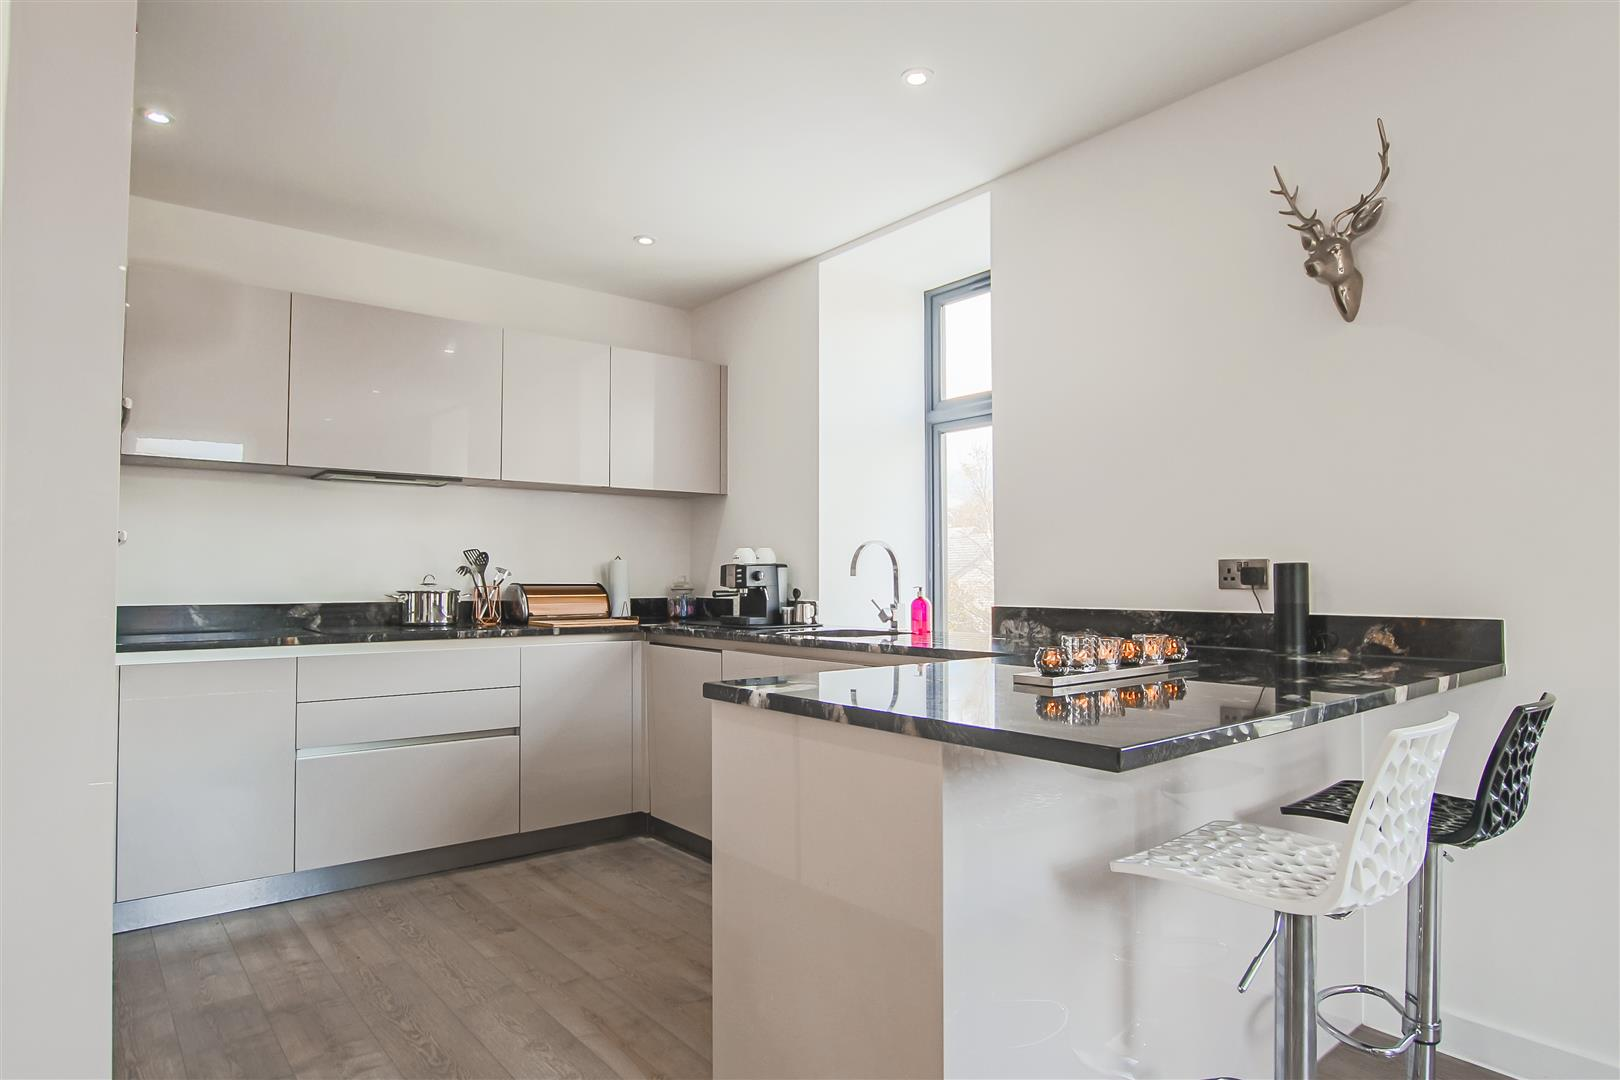 3 Bedroom Duplex Apartment For Sale - Image 27